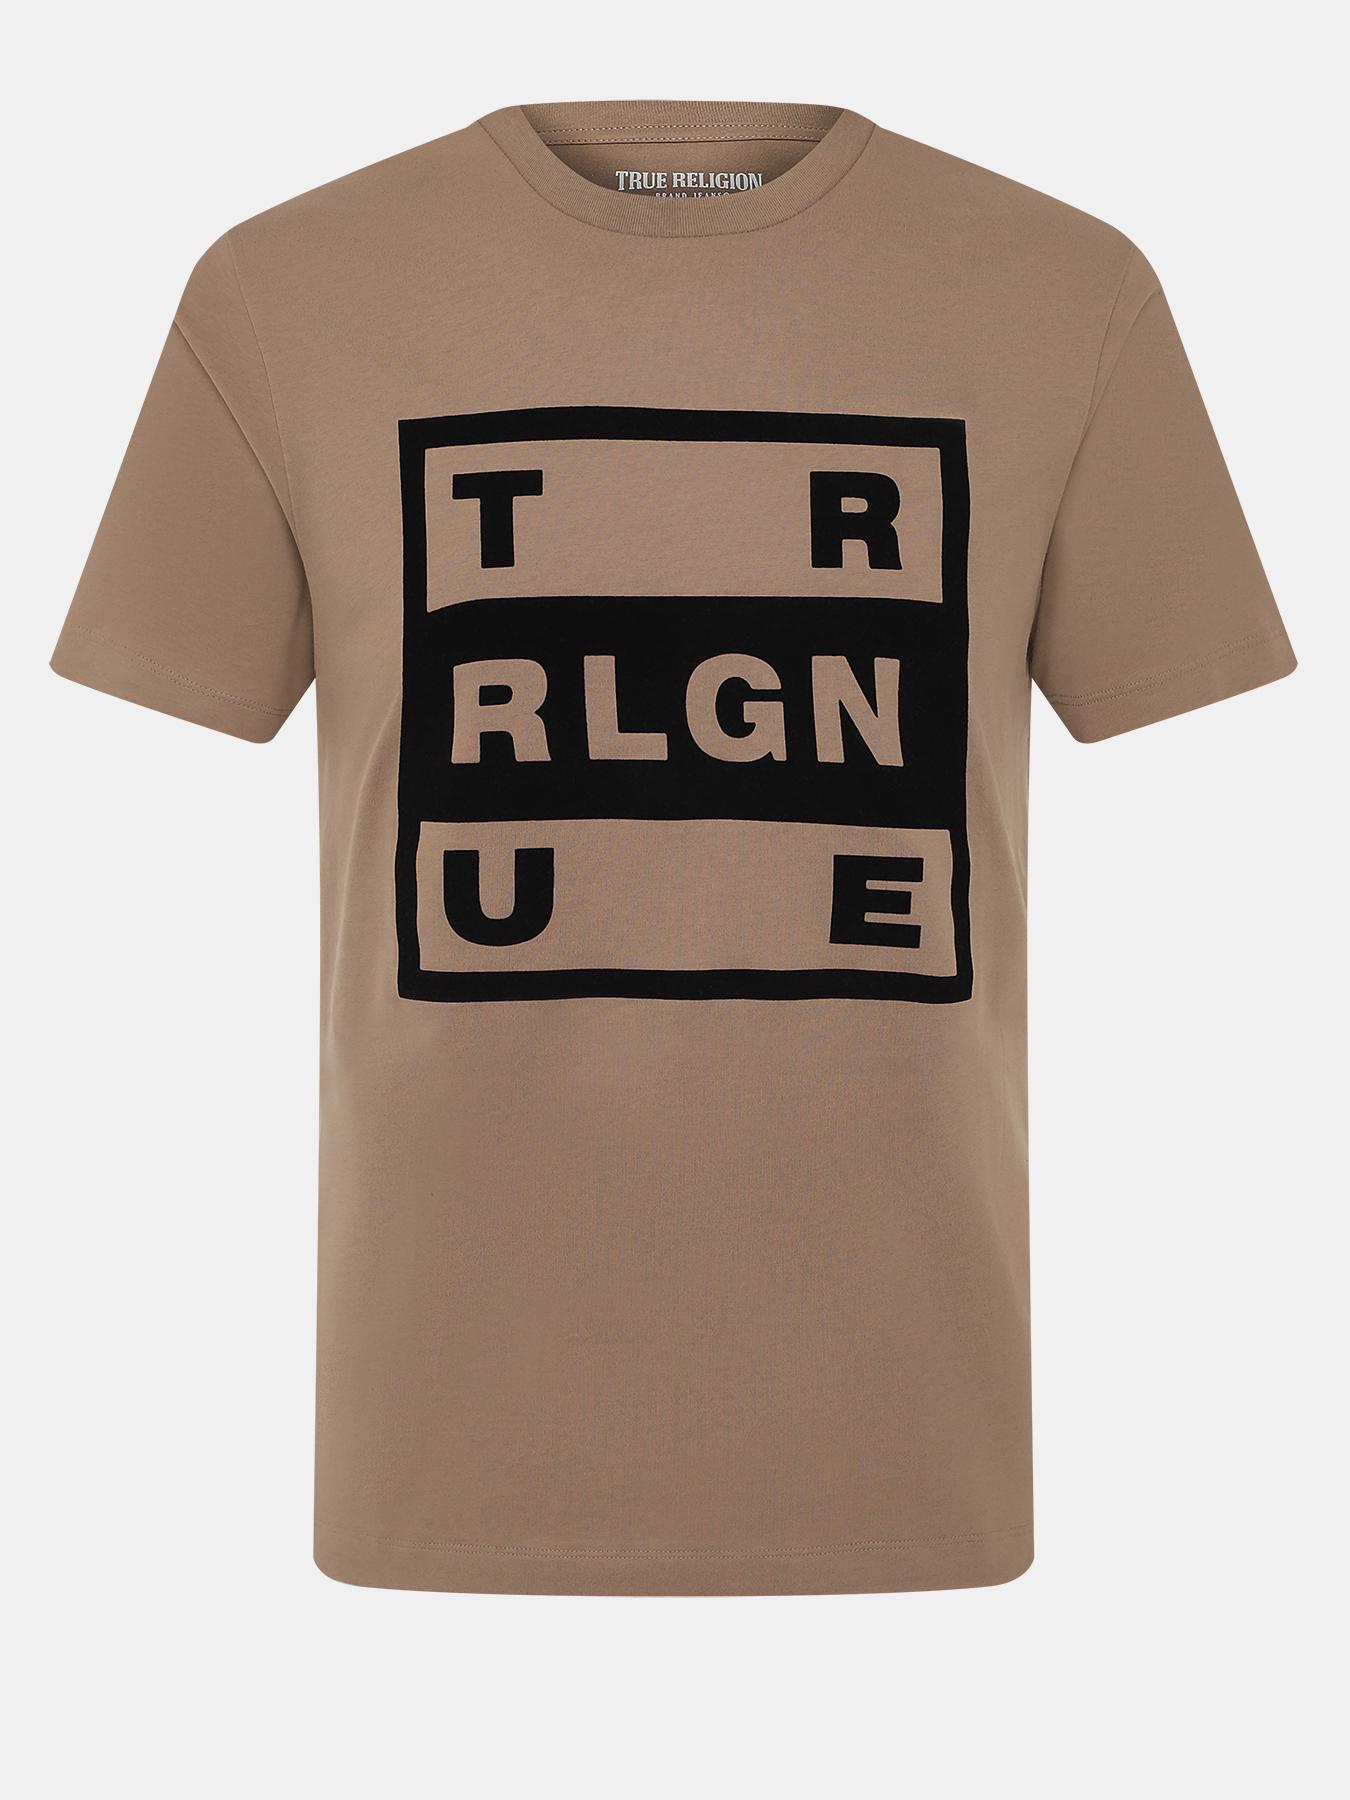 religion футболка Футболки True Religion Футболка